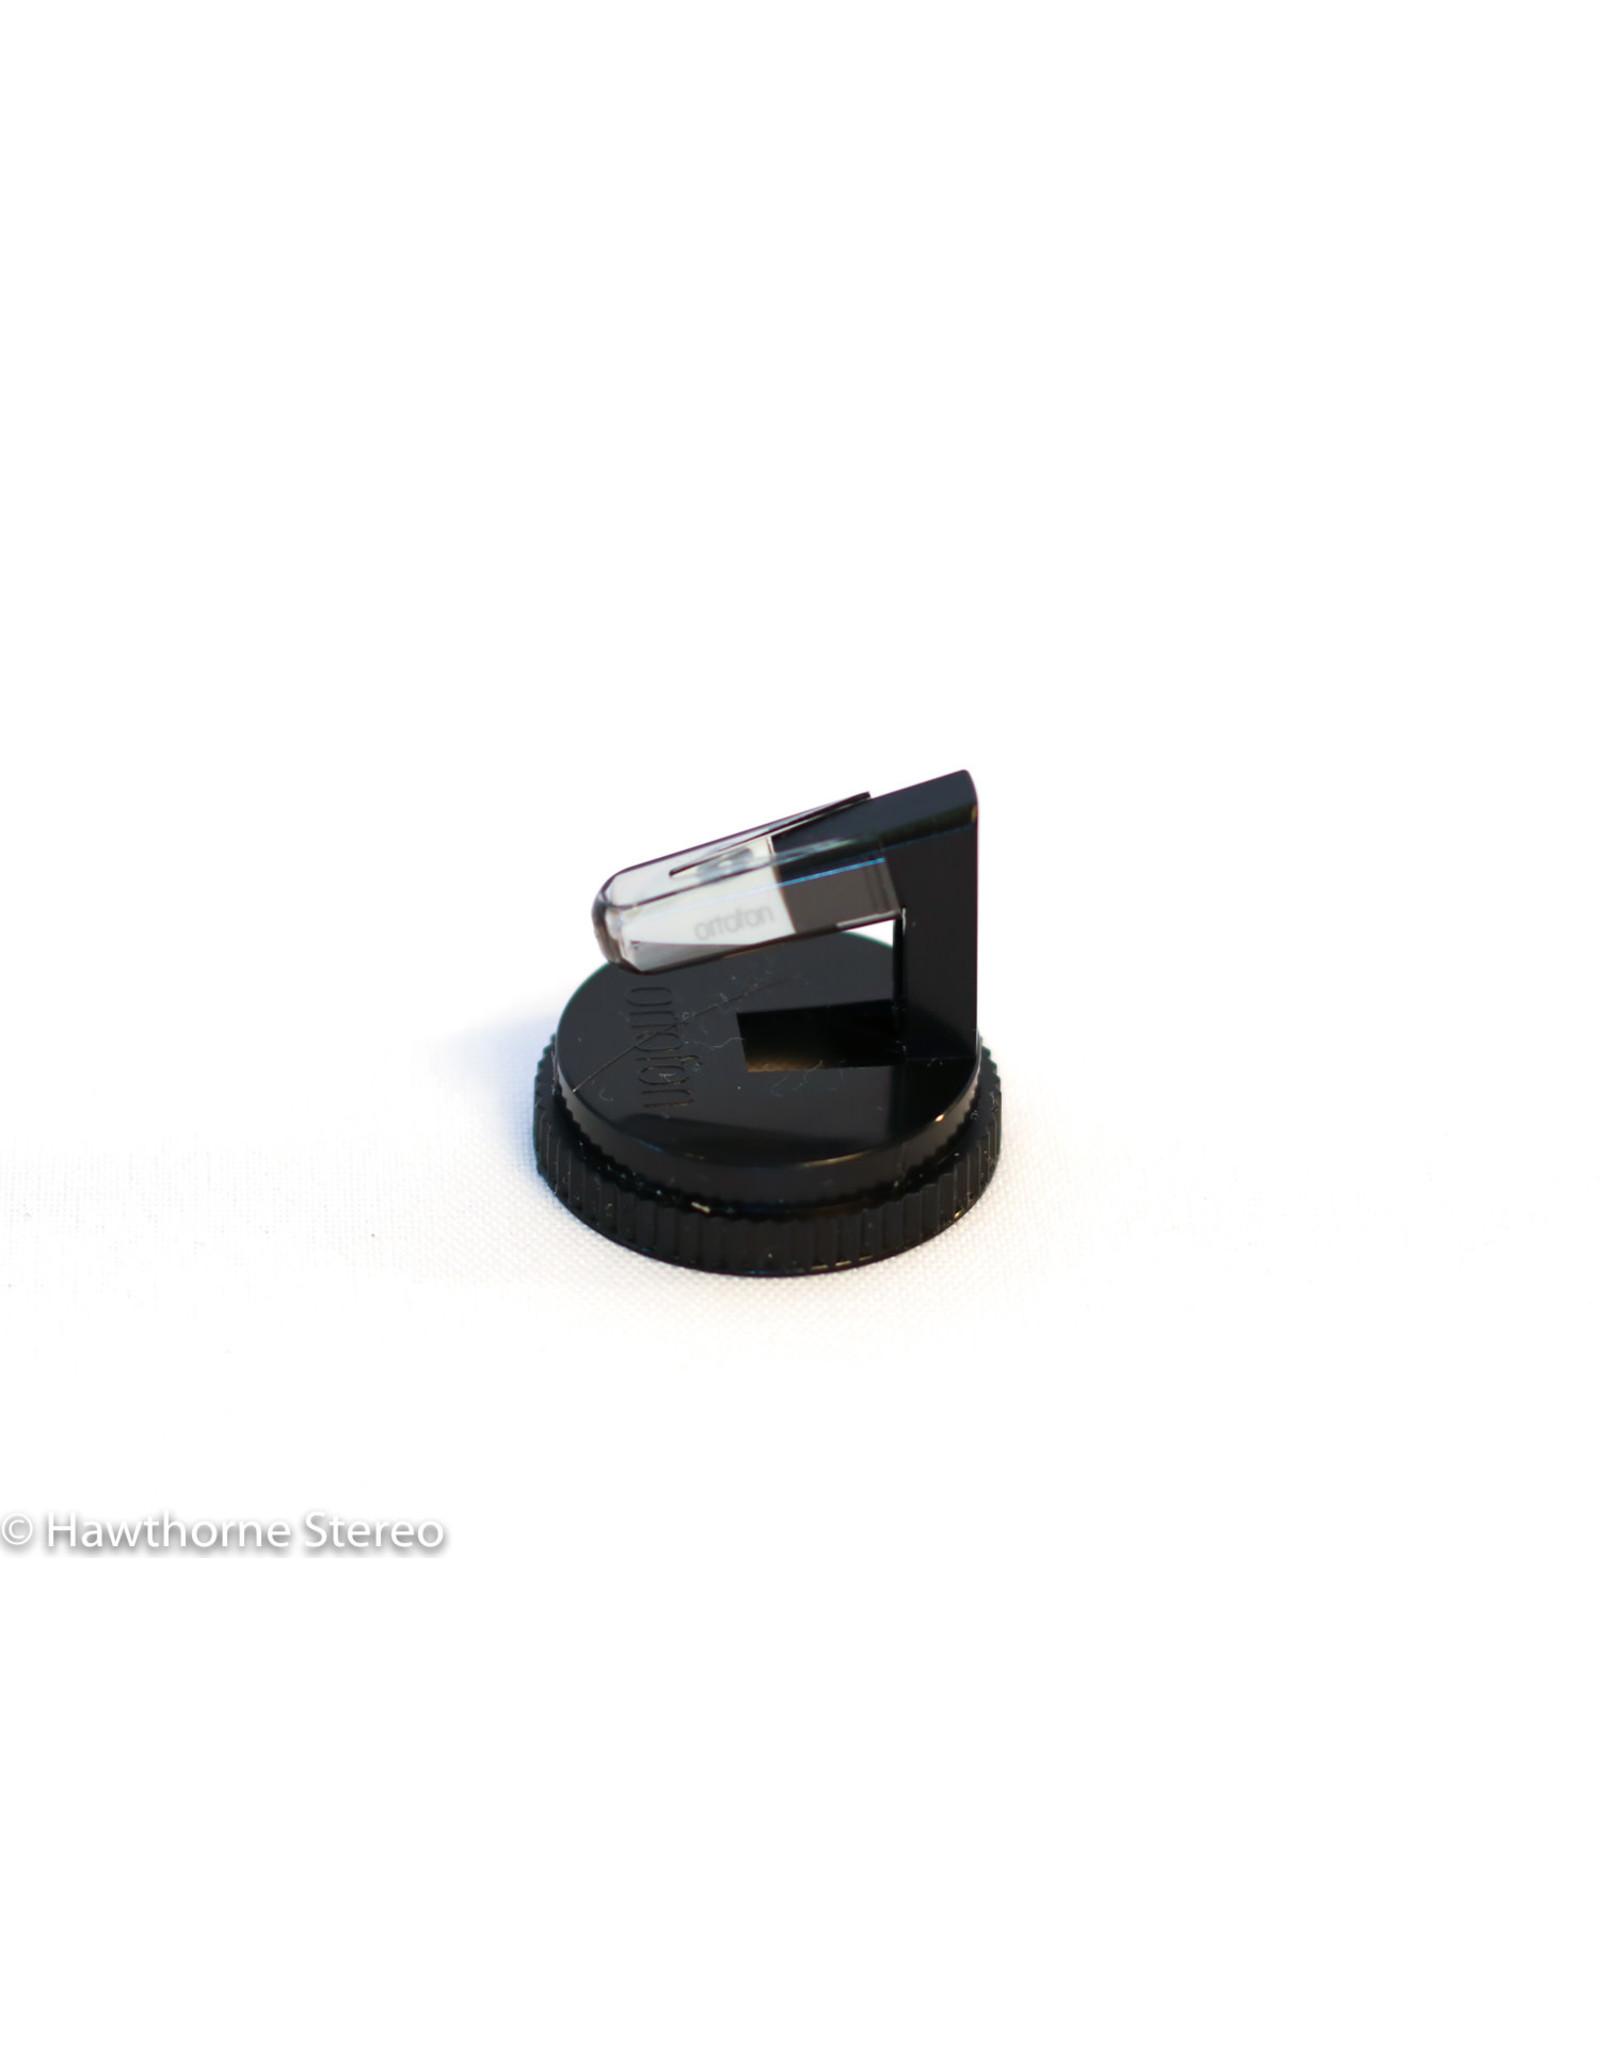 Ortofon Ortofon DJE stylus Phono Stylus USED